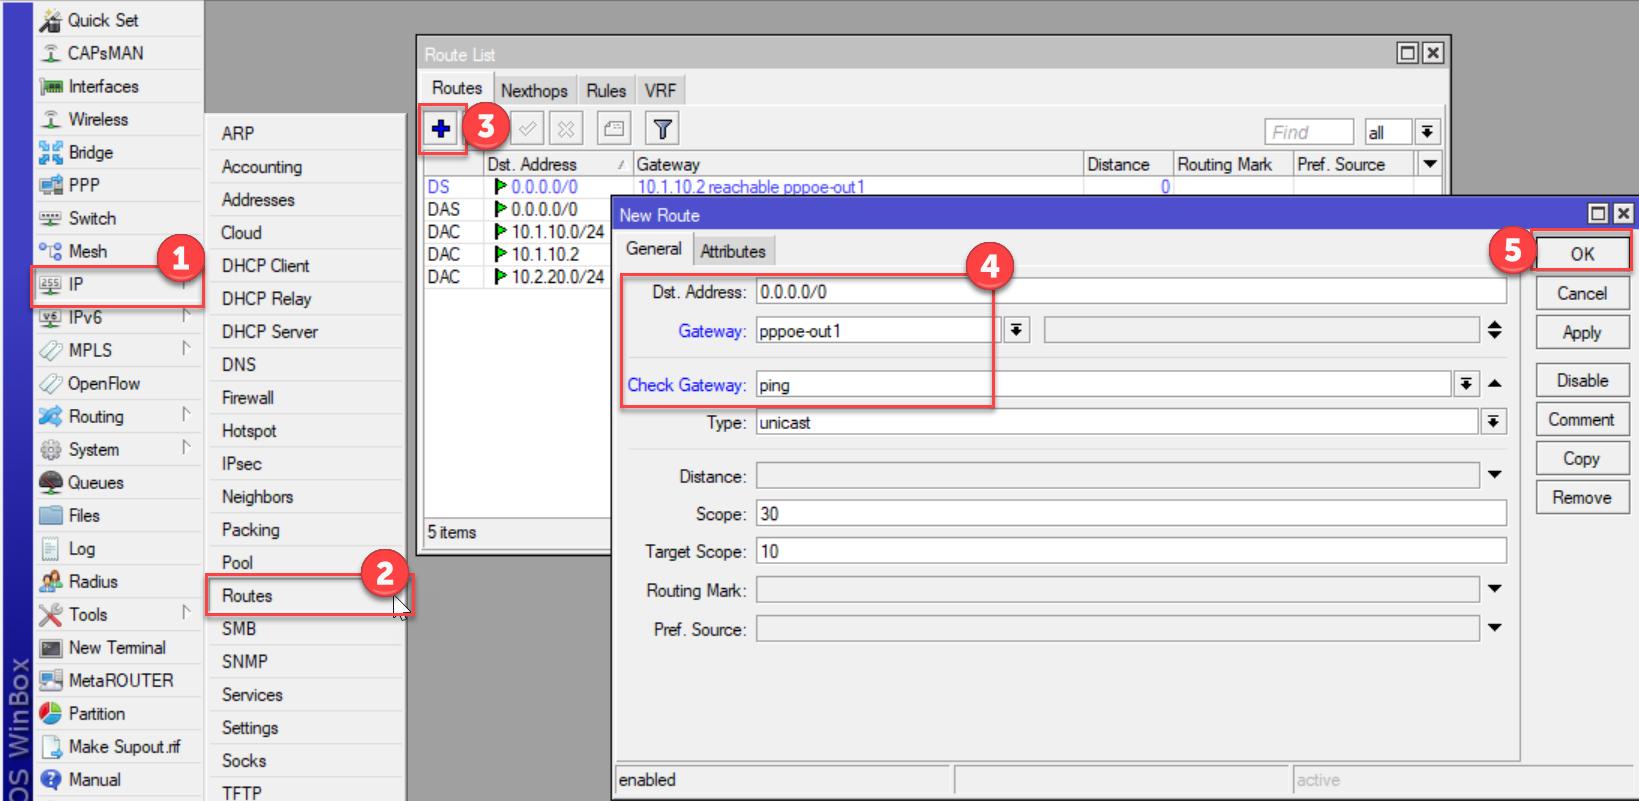 WAN : 3 WAN (1 PPPoE+ 1 DHCP + 1 Static) to LAN - ซิสทูยู ออนไลน์